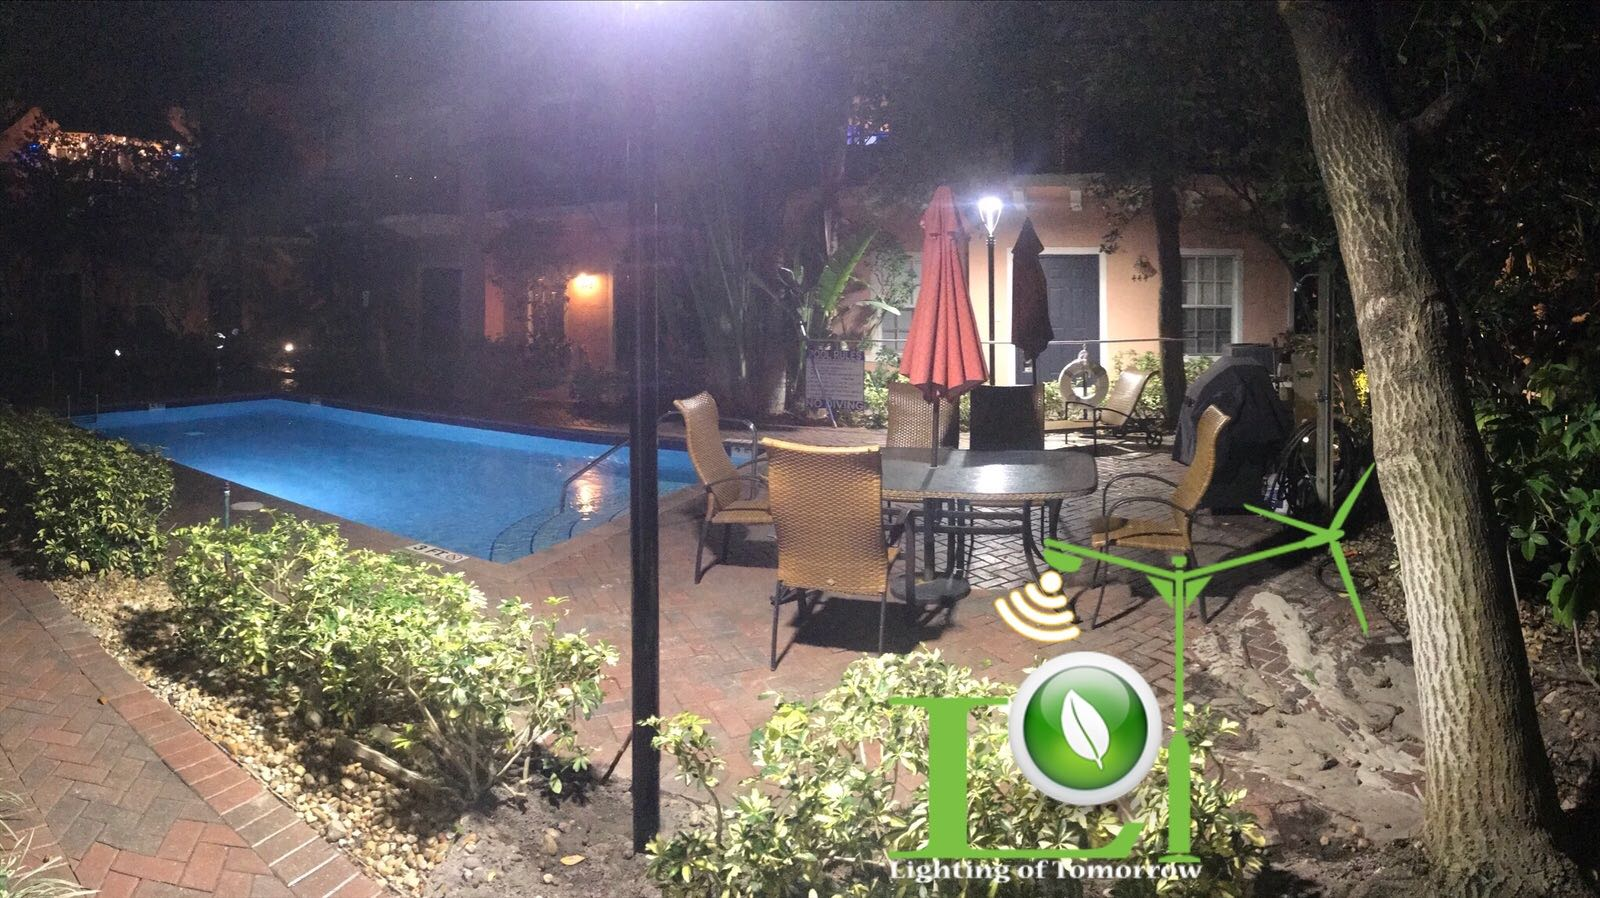 led-pool-area-lighting-of-tomorrow-2